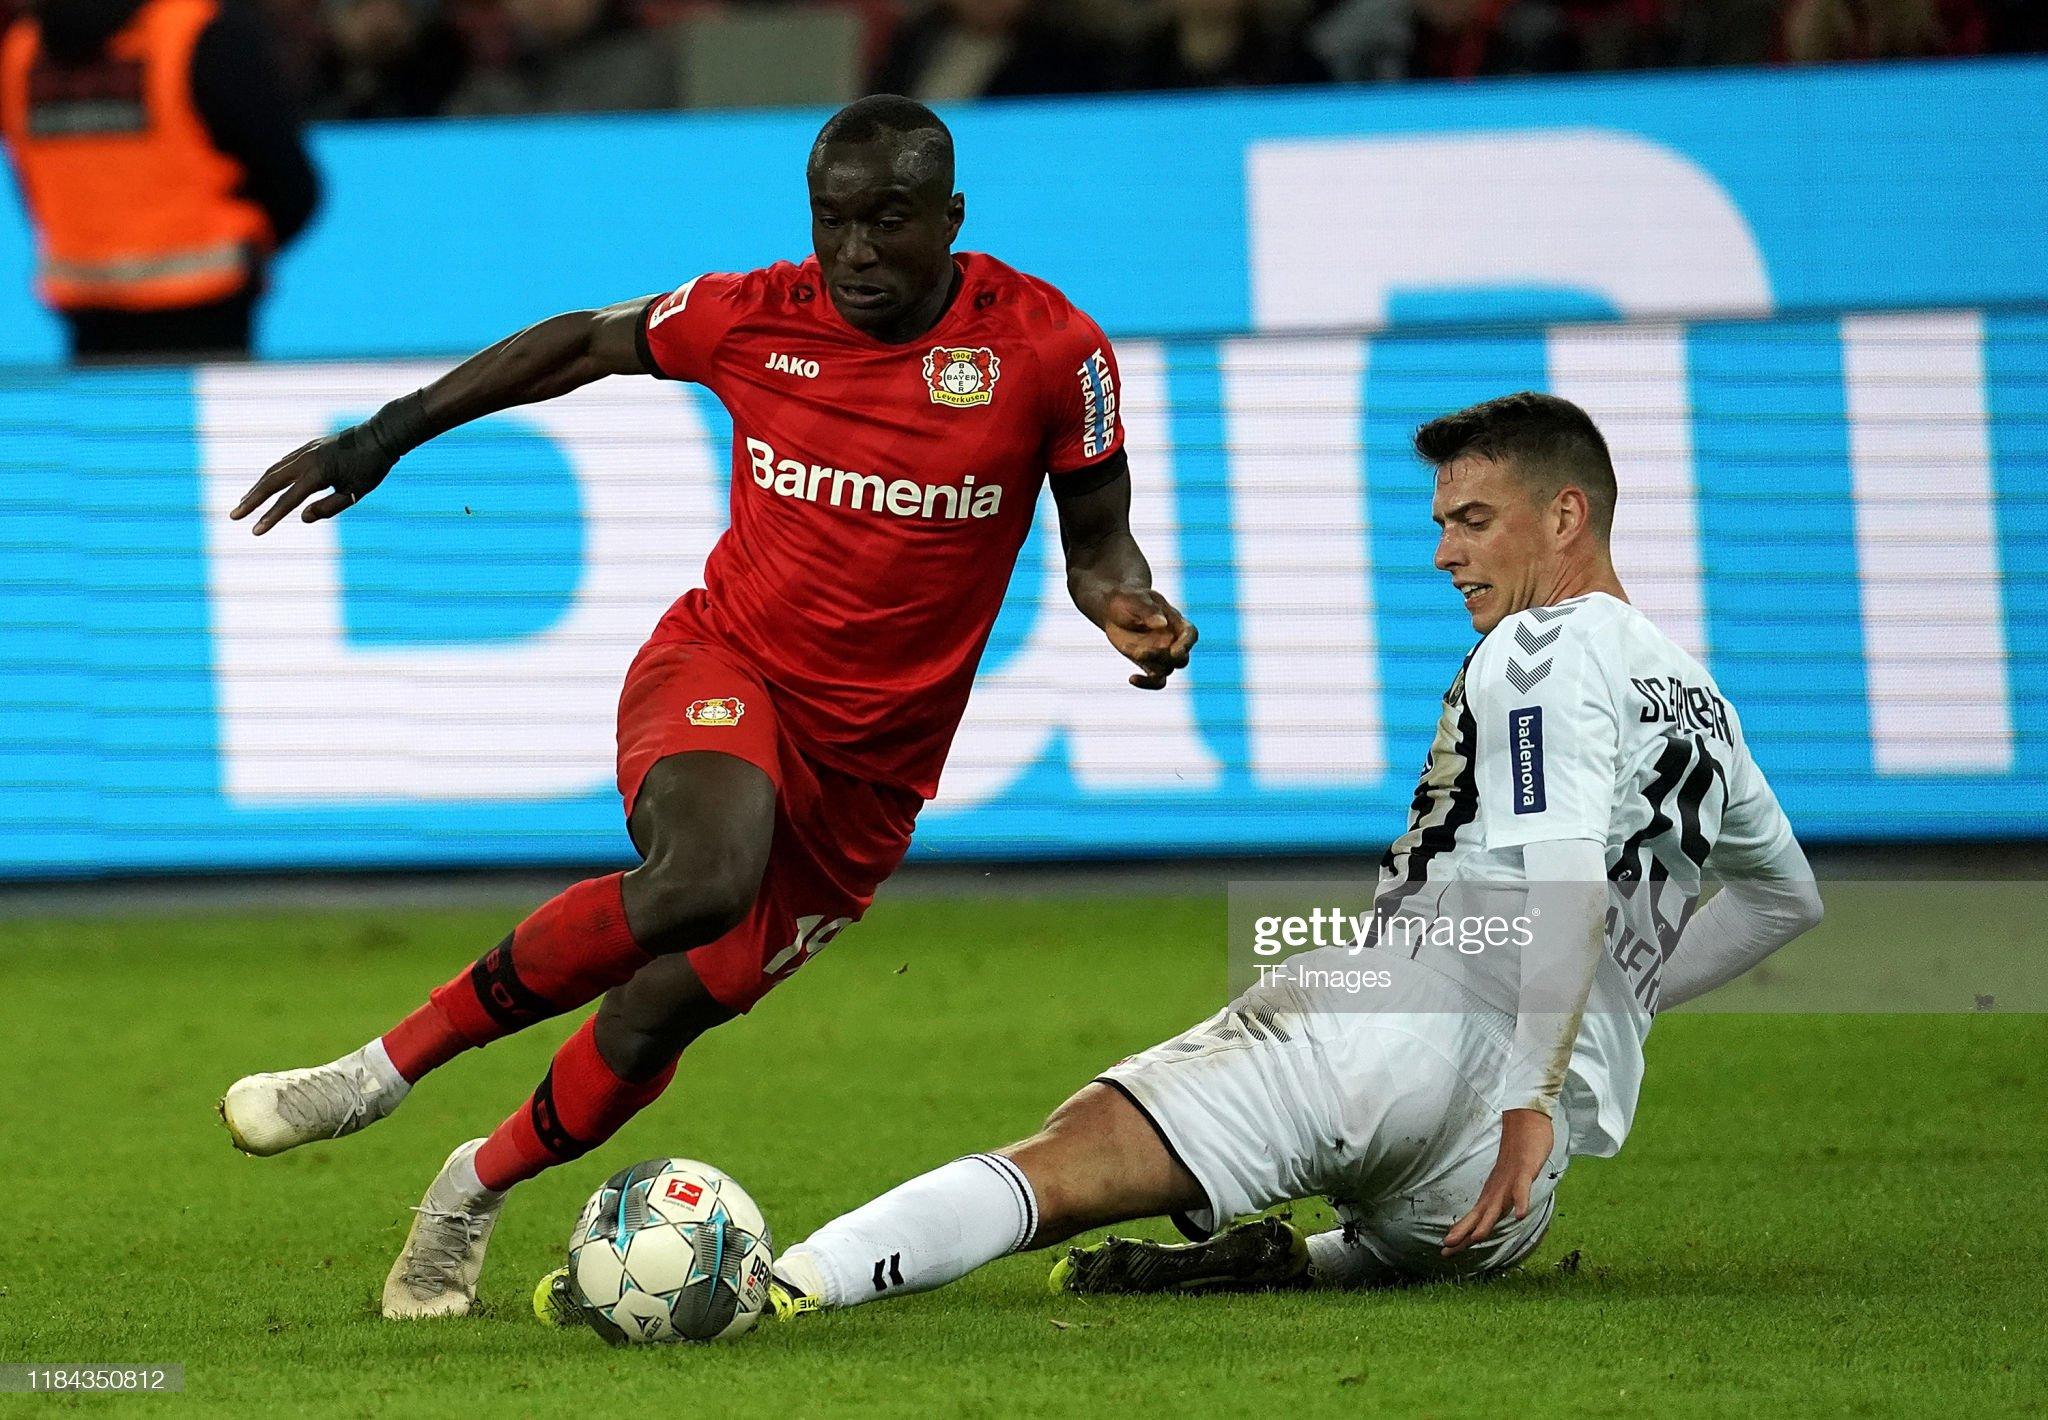 Freiburg vs Bayer Leverkusen Preview, prediction and odds